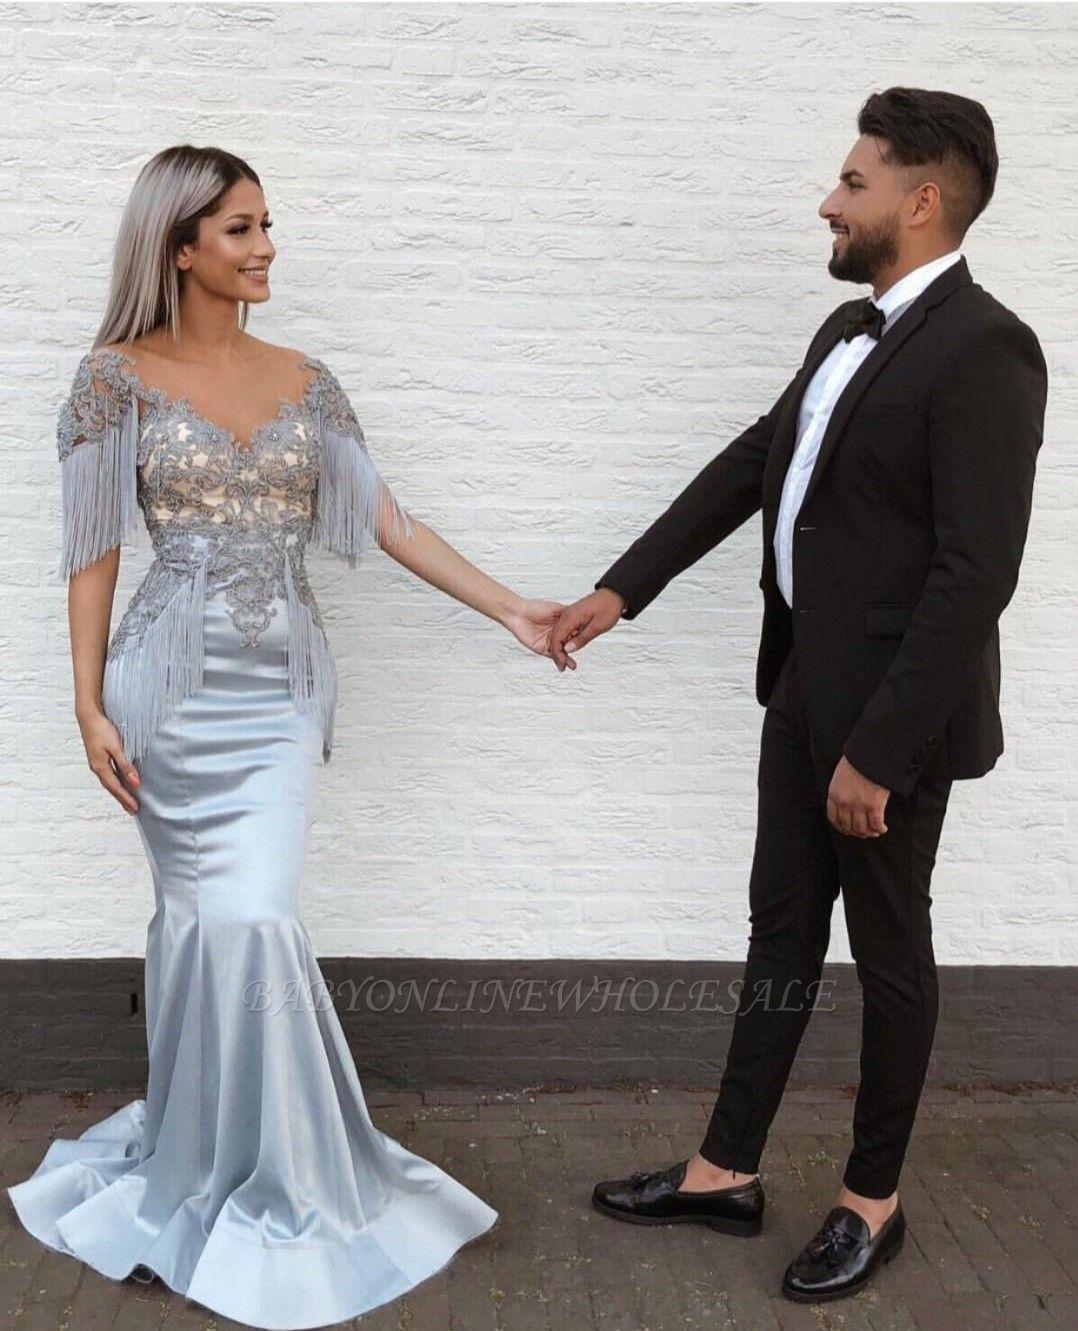 Elegant Mermaid Sky Blue Evening Gowns | V-Neck Prom Dresses with Tassels